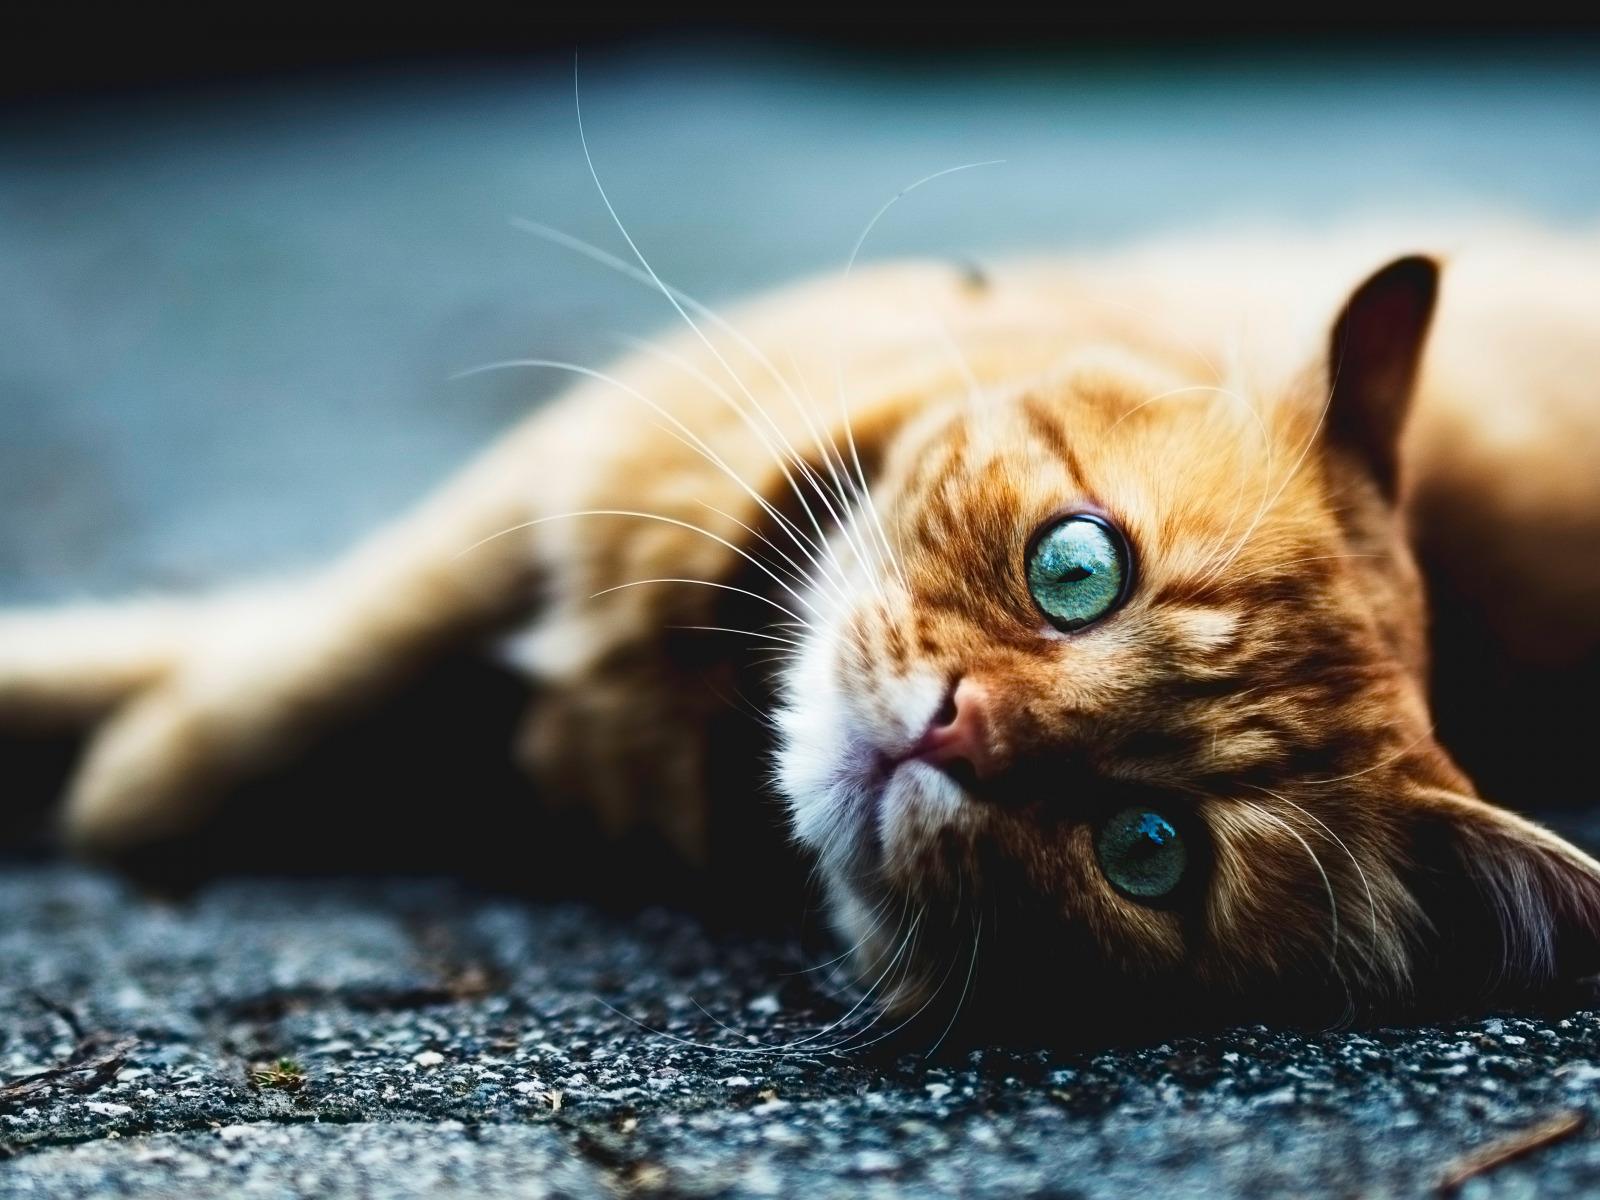 Обои котёнок, голубые глазки, мордочка. Кошки foto 14